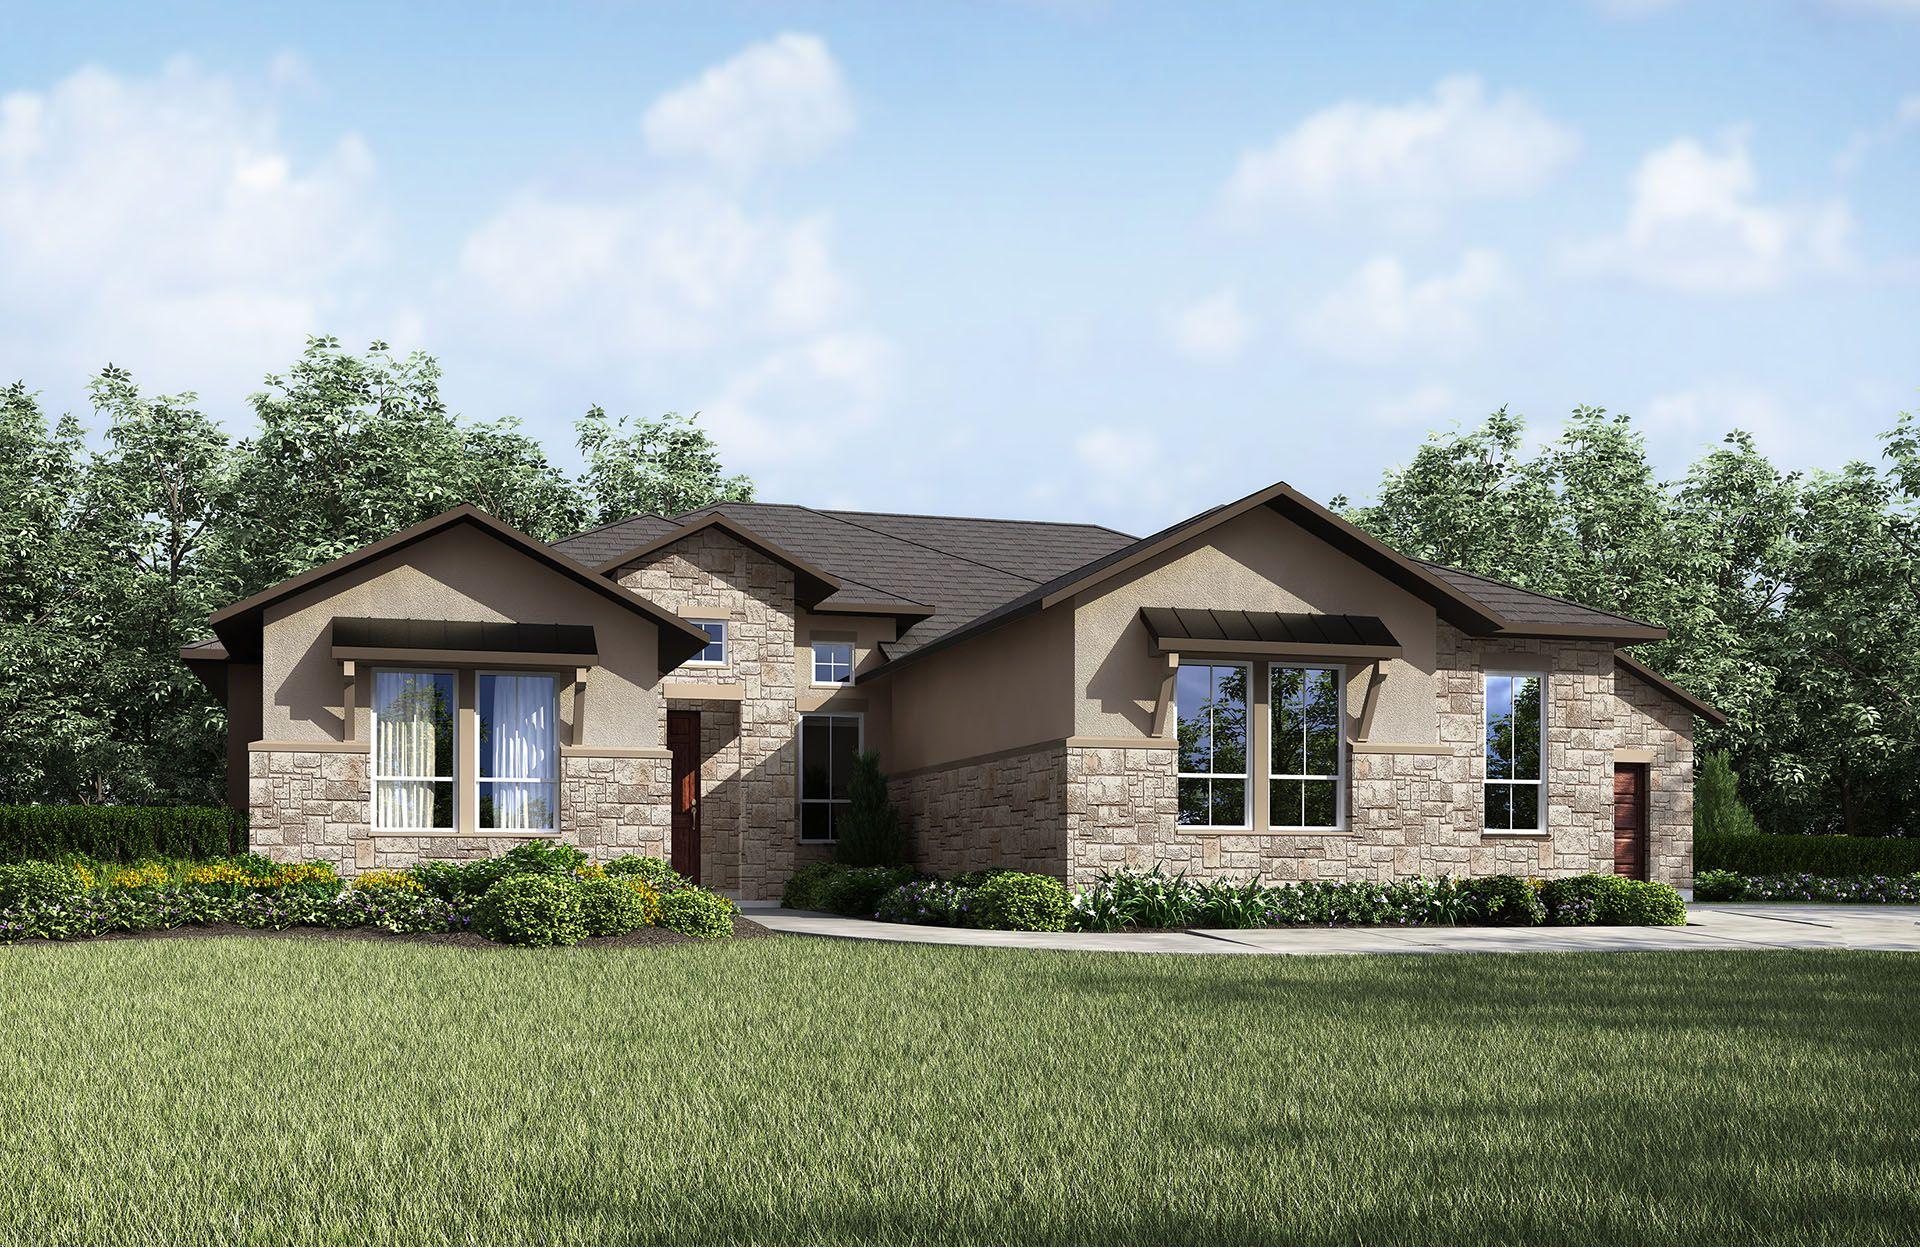 Single Family for Sale at Cimarron Hills - Chandler Iii 307 Flint Ridge Trail Georgetown, Texas 78628 United States